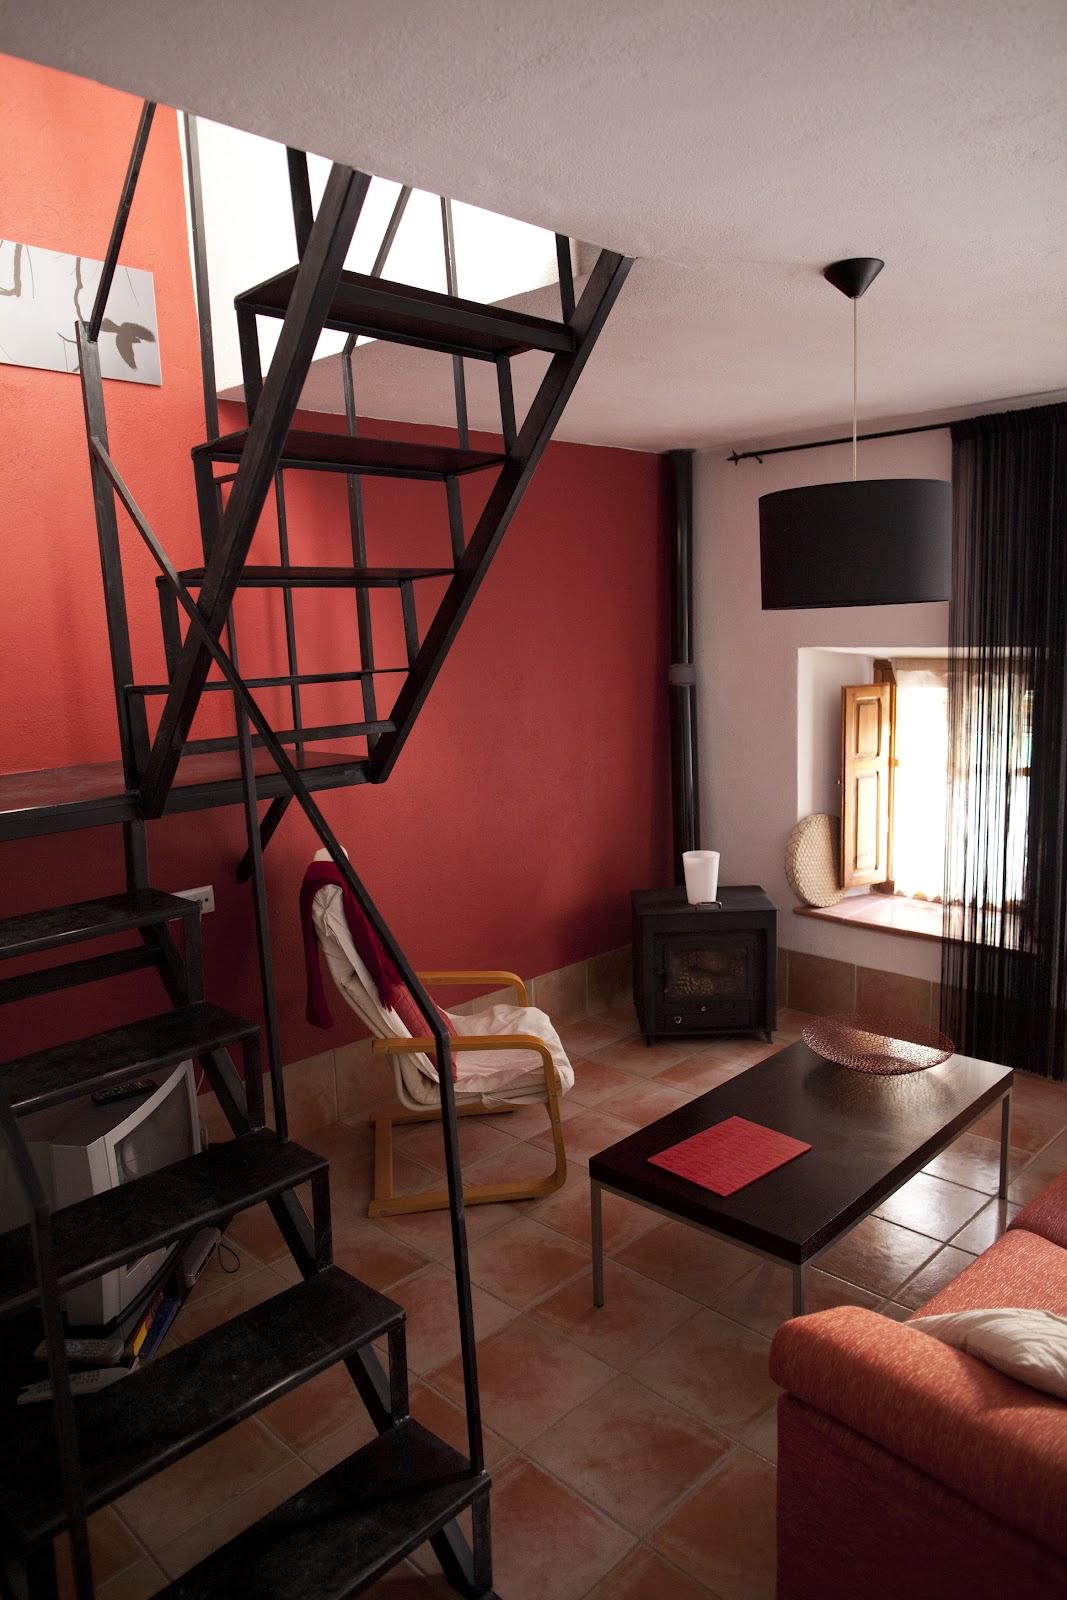 Dg arquitecto valencia marzo 2012 for Estudiar interiorismo